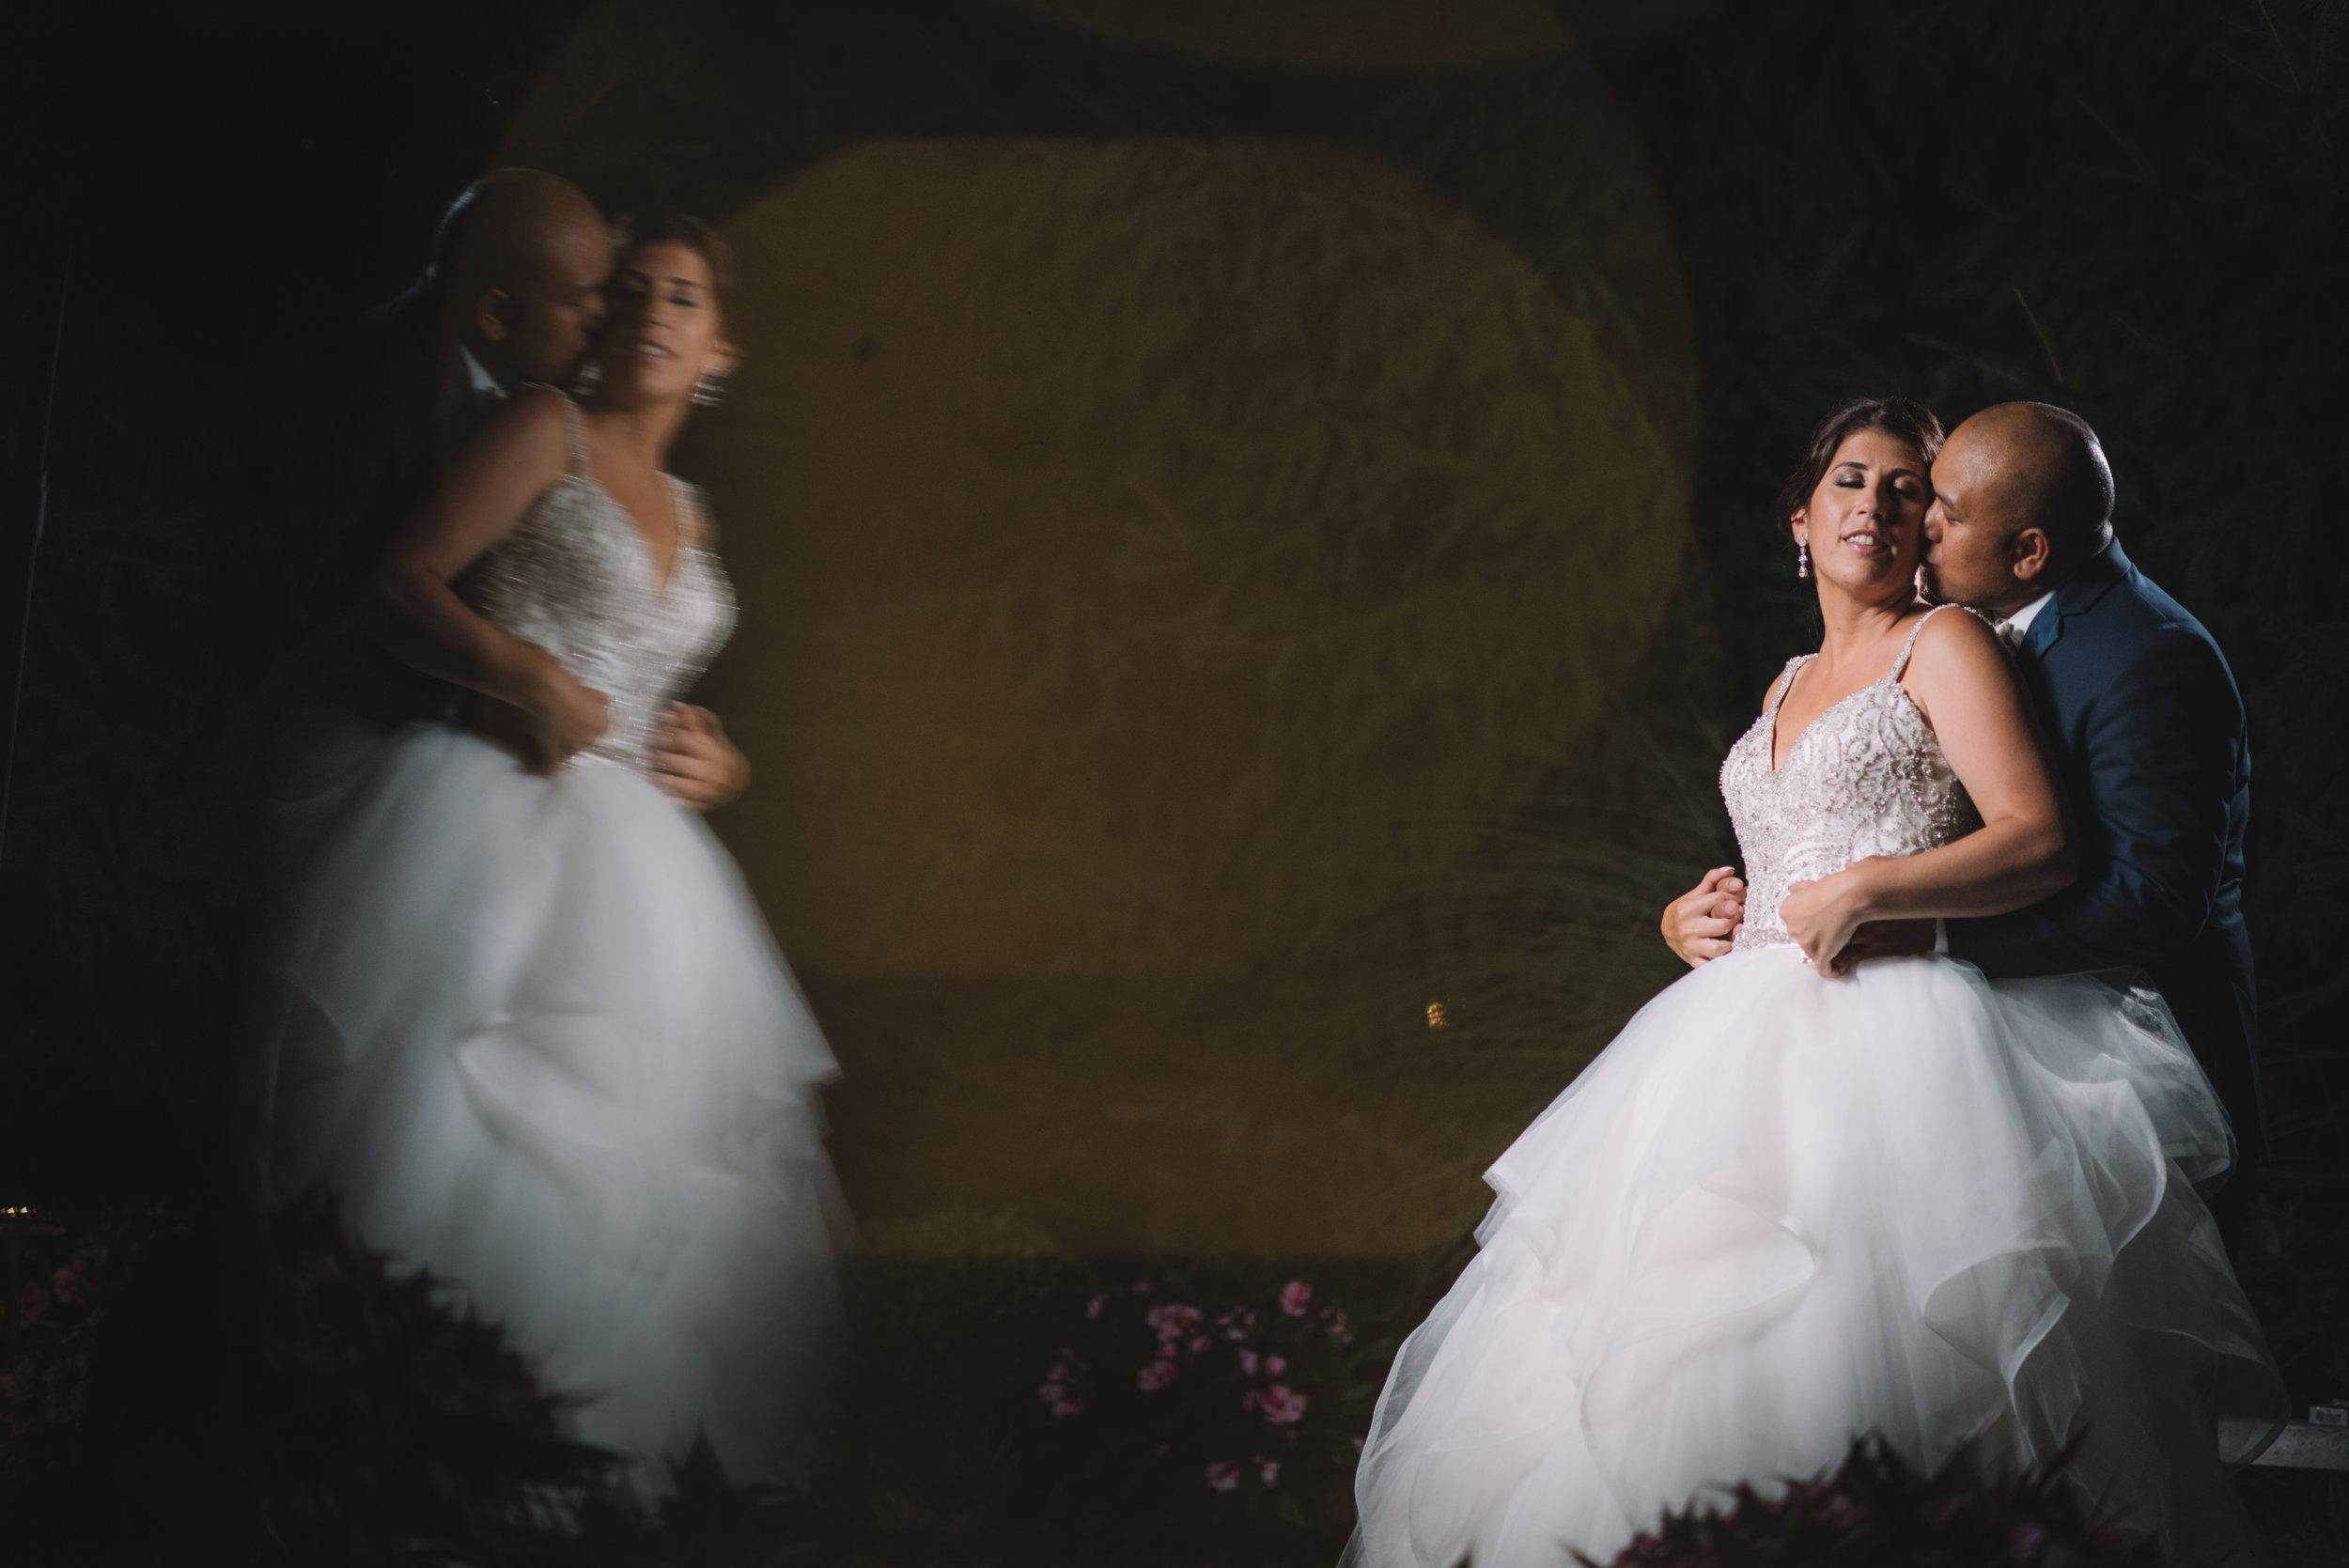 WeddingPhotos | NJPhotographer | Highlights-14-2.jpg